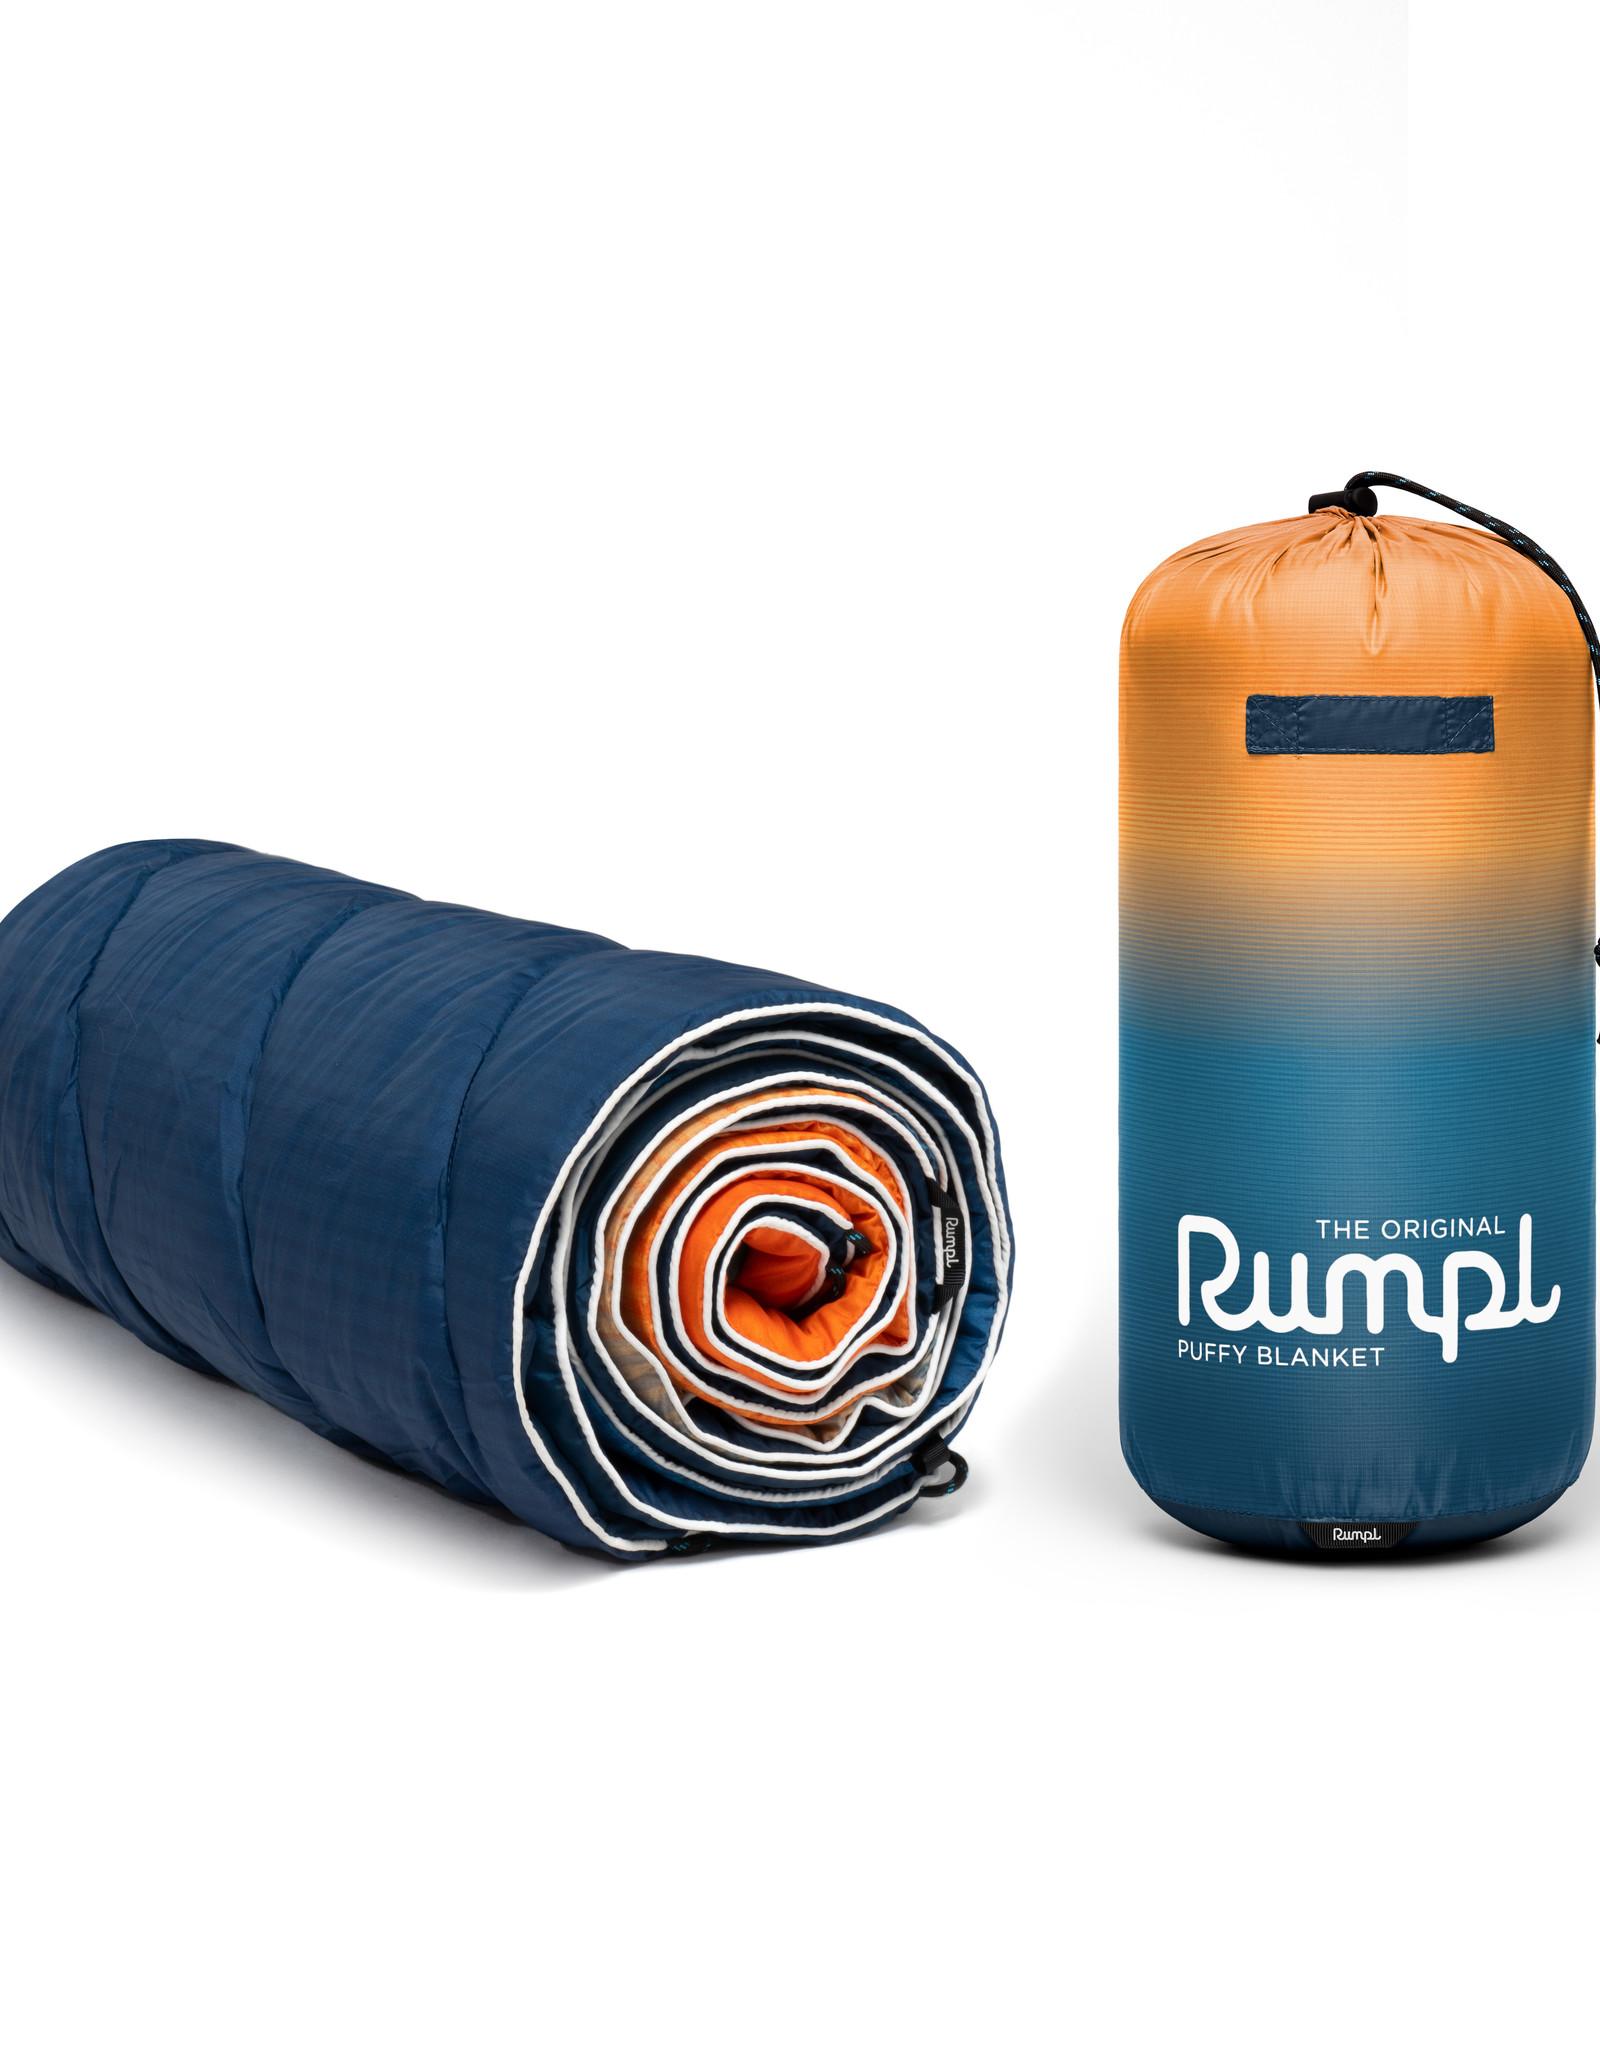 RUMPL RUMPL ORIGINAL PRINTED PUFFY BLANKET-SUNSET FADE